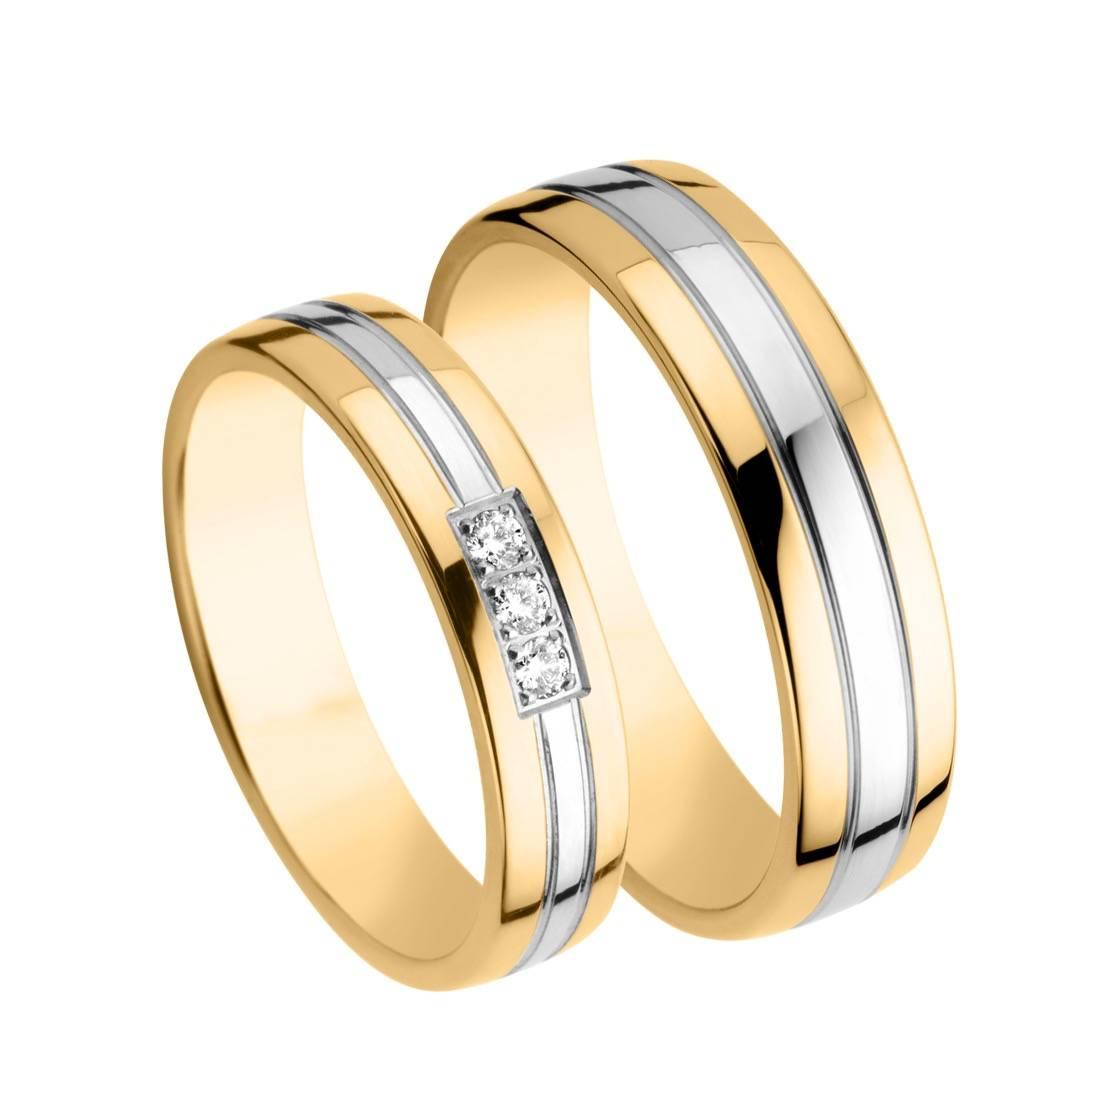 Juwelier Jan Maes - Trouwringen - Verlovingsringen - Juwelen - House of Weddings - 9